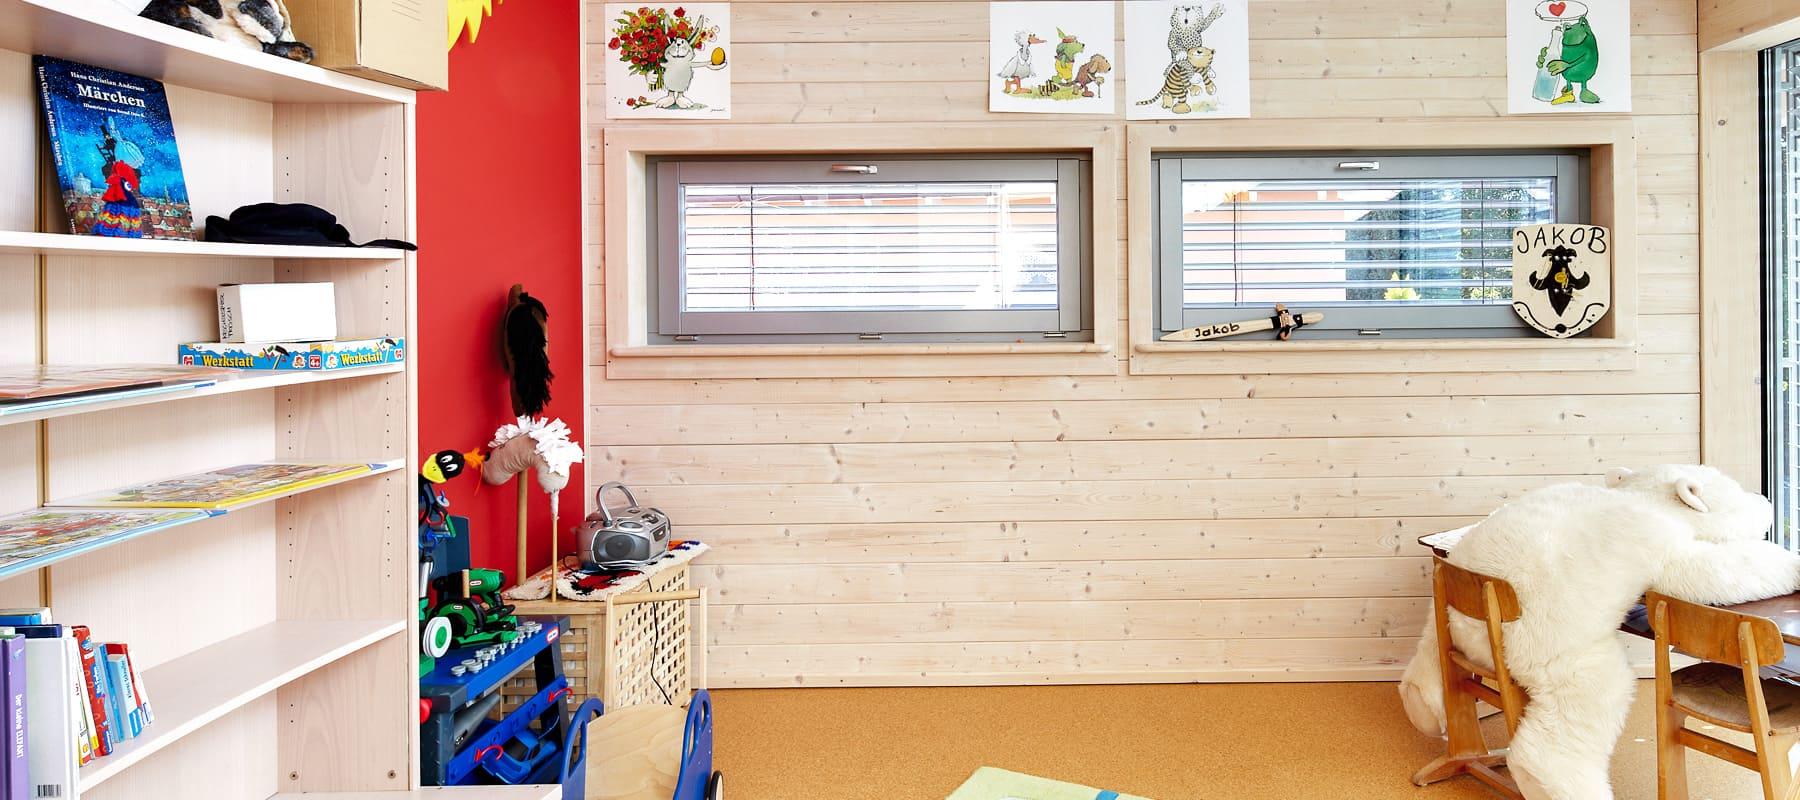 sonnleitner haus münchen grundriss Kundenhaus ugsburg - ein Holzhaus im modernen Stil - Sonnleitner ...